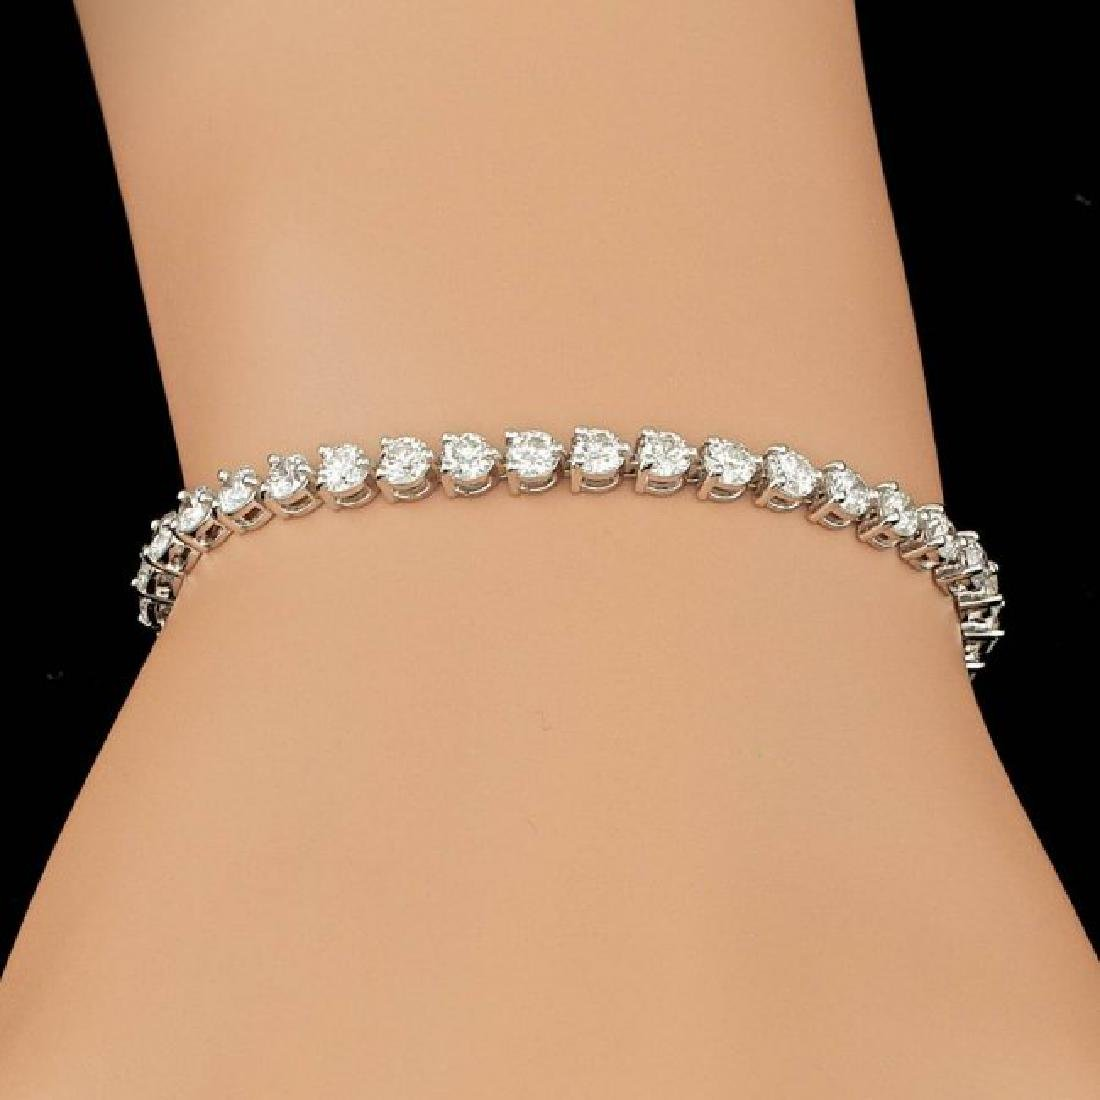 18k White Gold 6.25ct Diamond Bracelet - 4